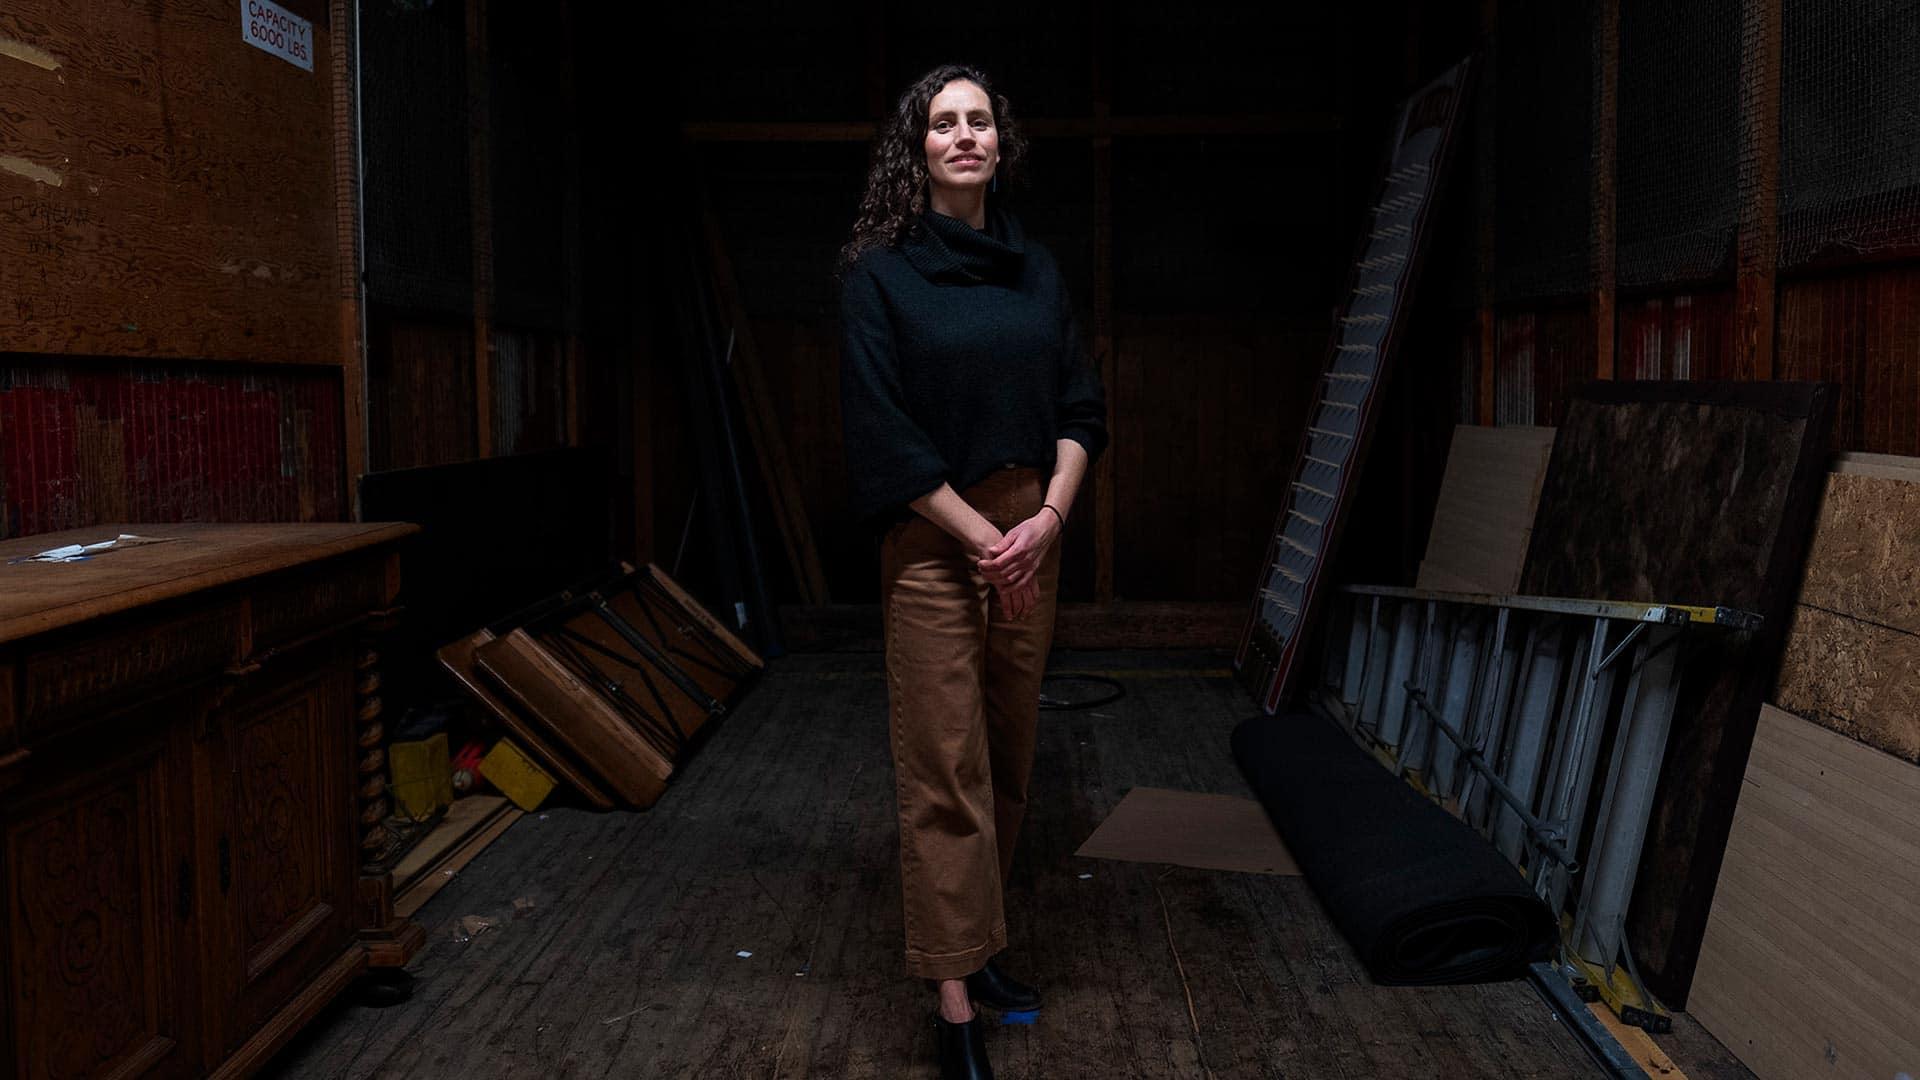 Elevating stories #3: Heather Hansman